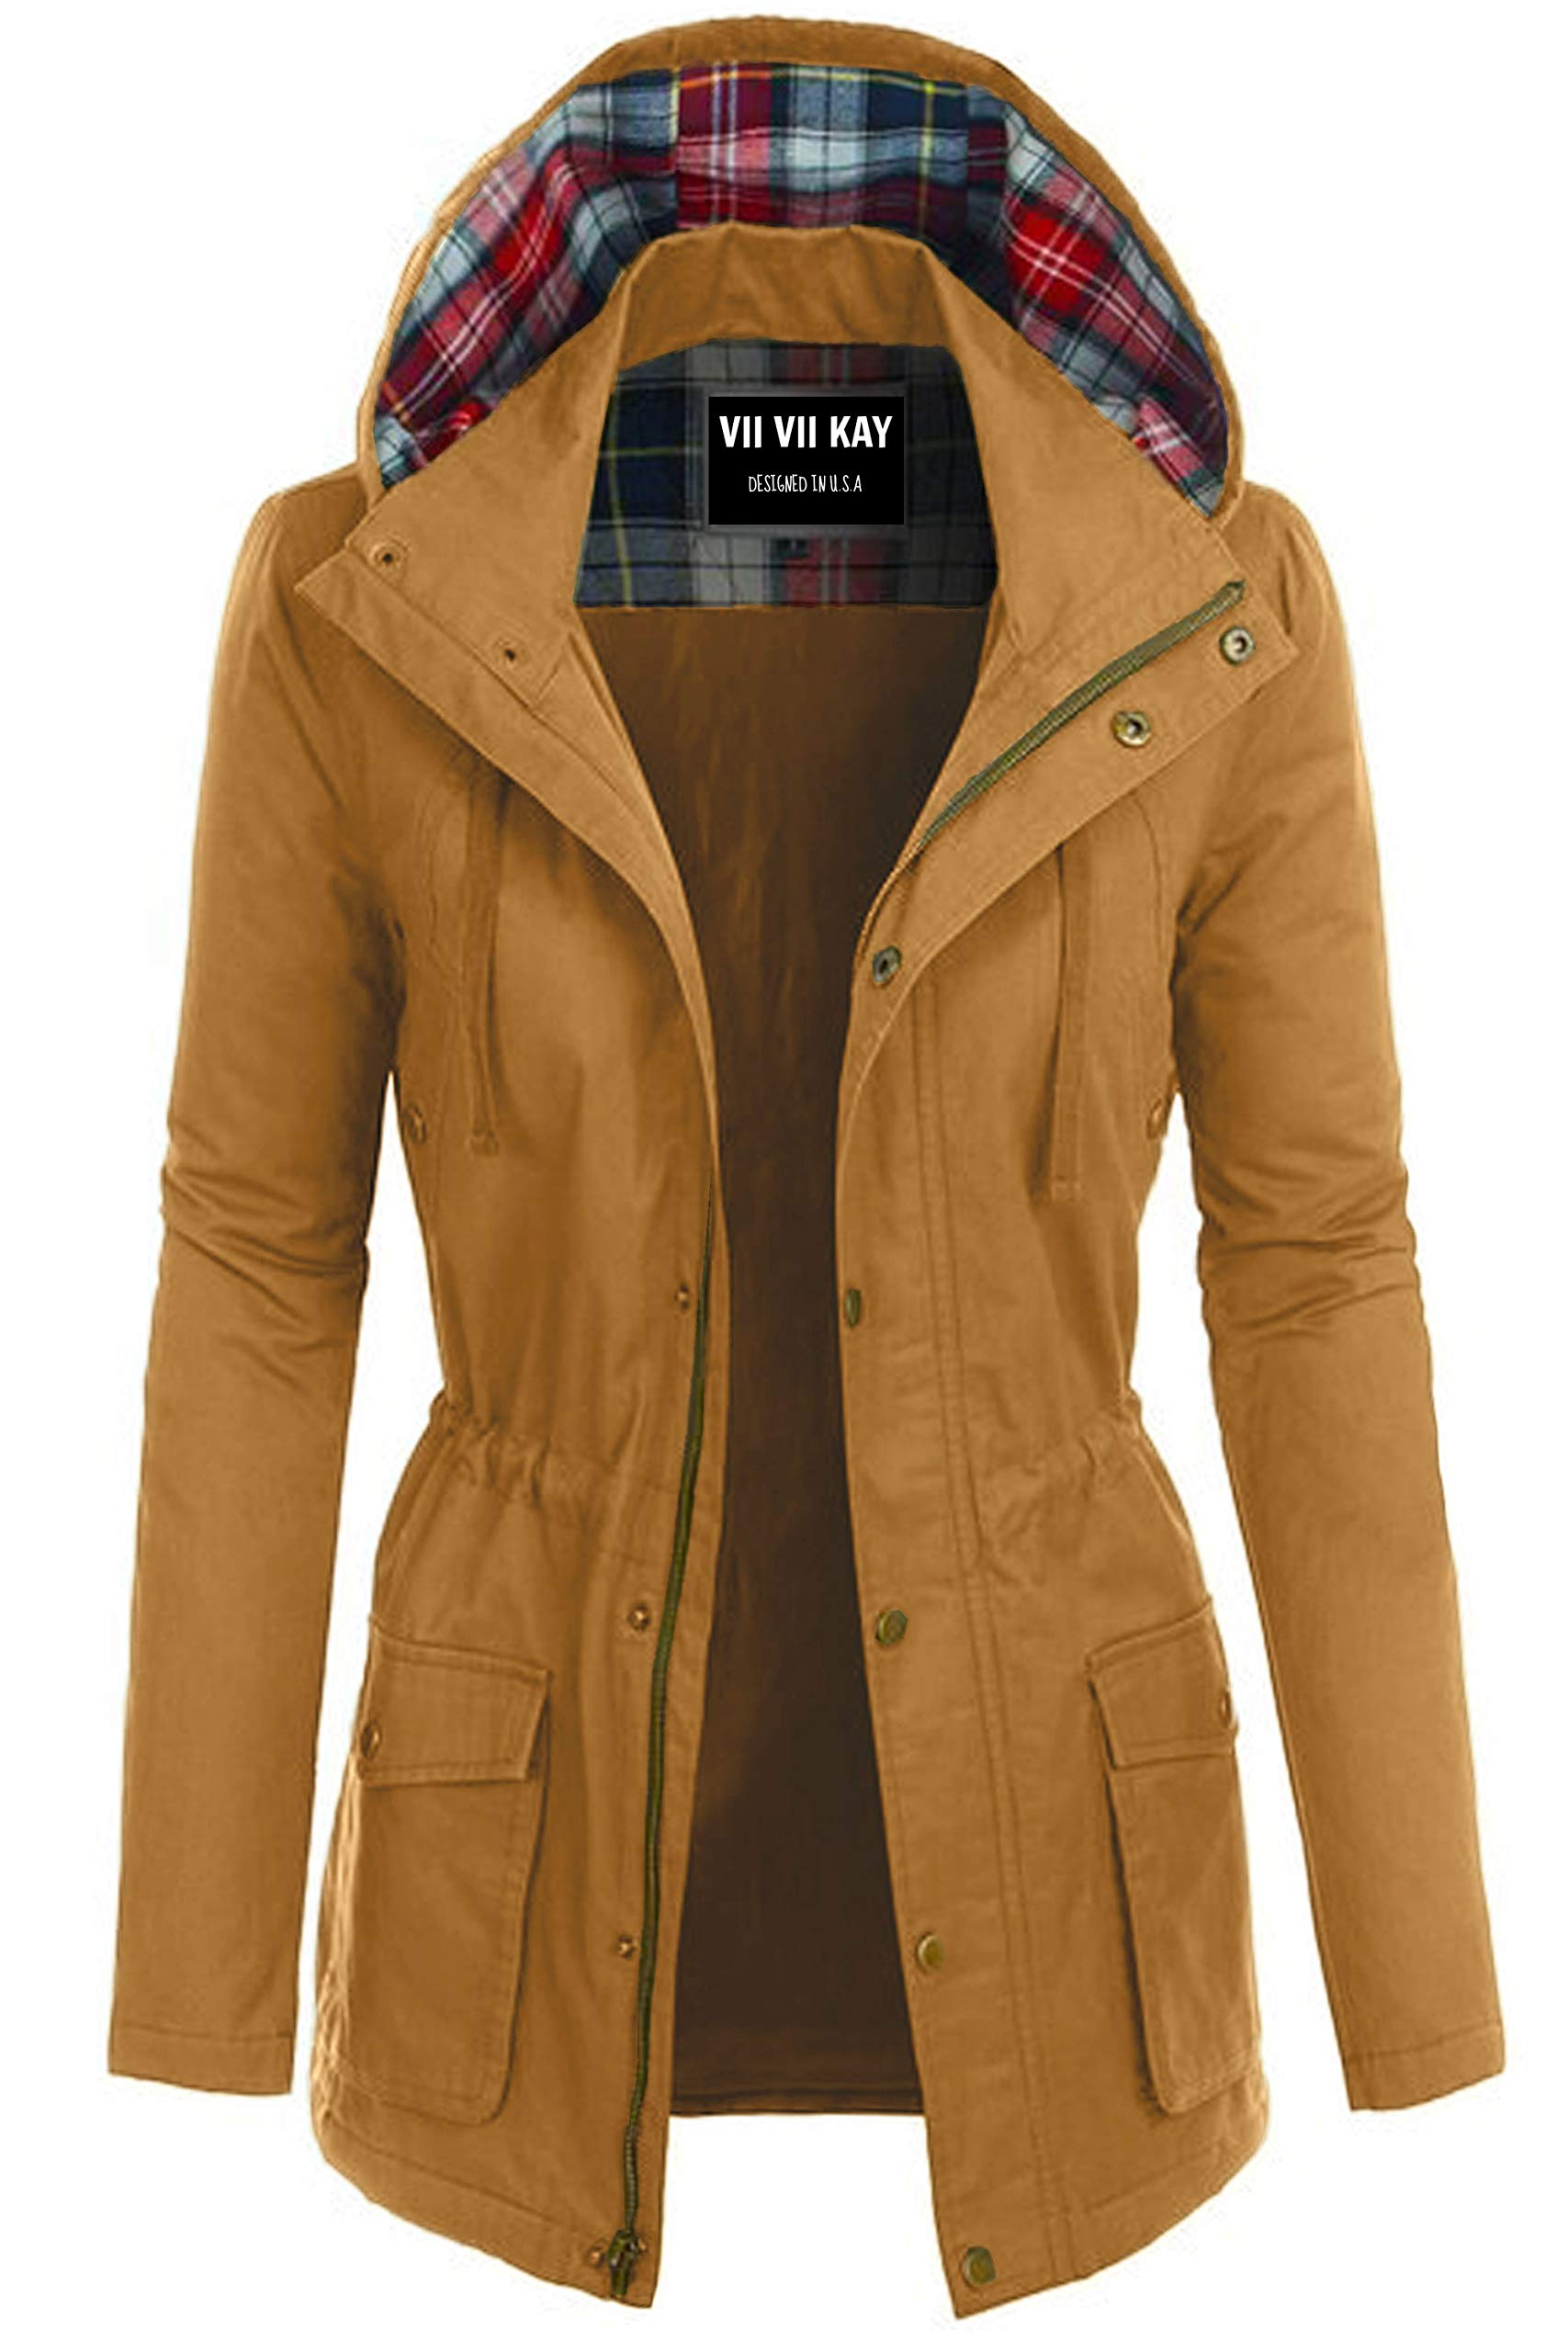 ViiViiKay Womens Cotton Anorak Lightweight Utility Parka Jackets with Drawstring 552_ Mustard 2X